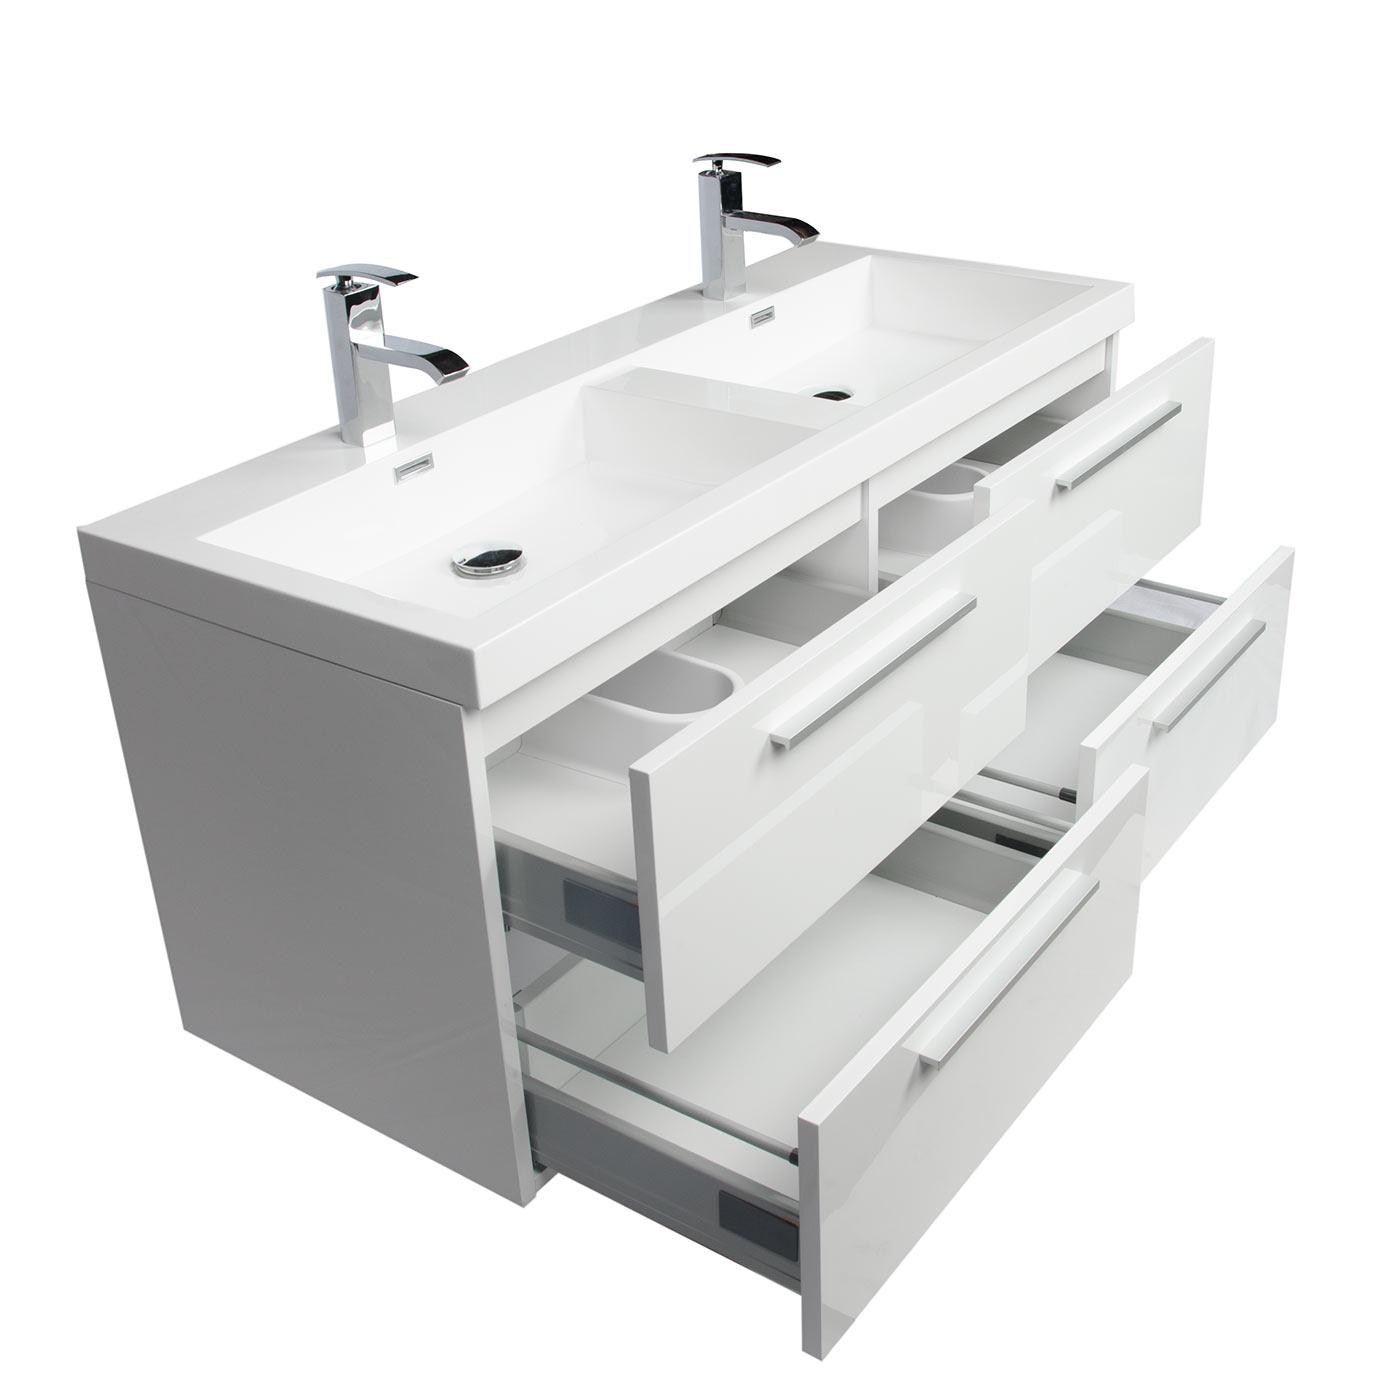 inch ansen shelf bottom levar top bathroom me fully grey open regarding plan vanity design without finish in